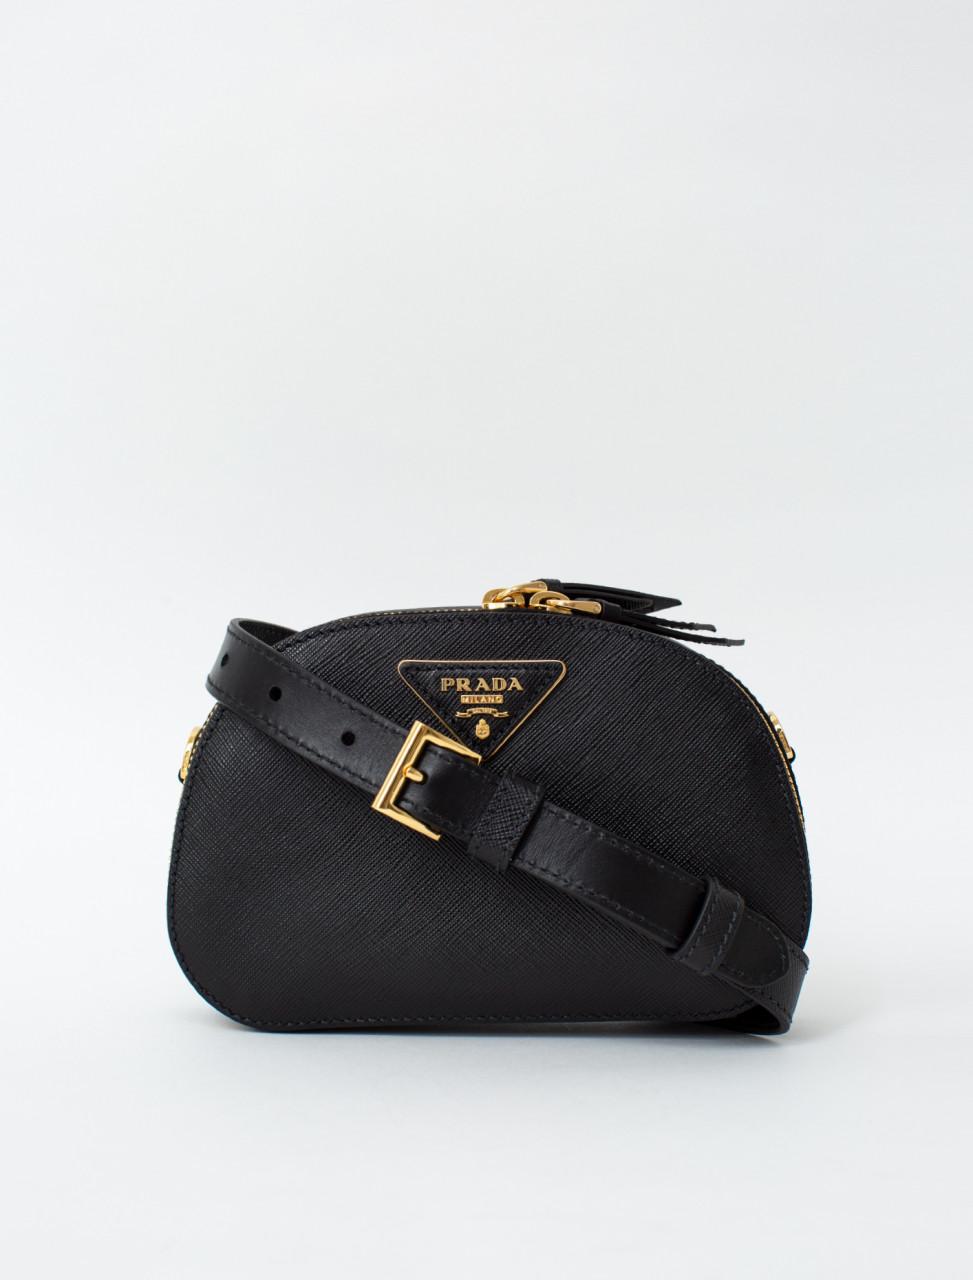 69c876f0d Prada Odette Saffiano Belt Bag | Voo Store Berlin | Worldwide Shipping